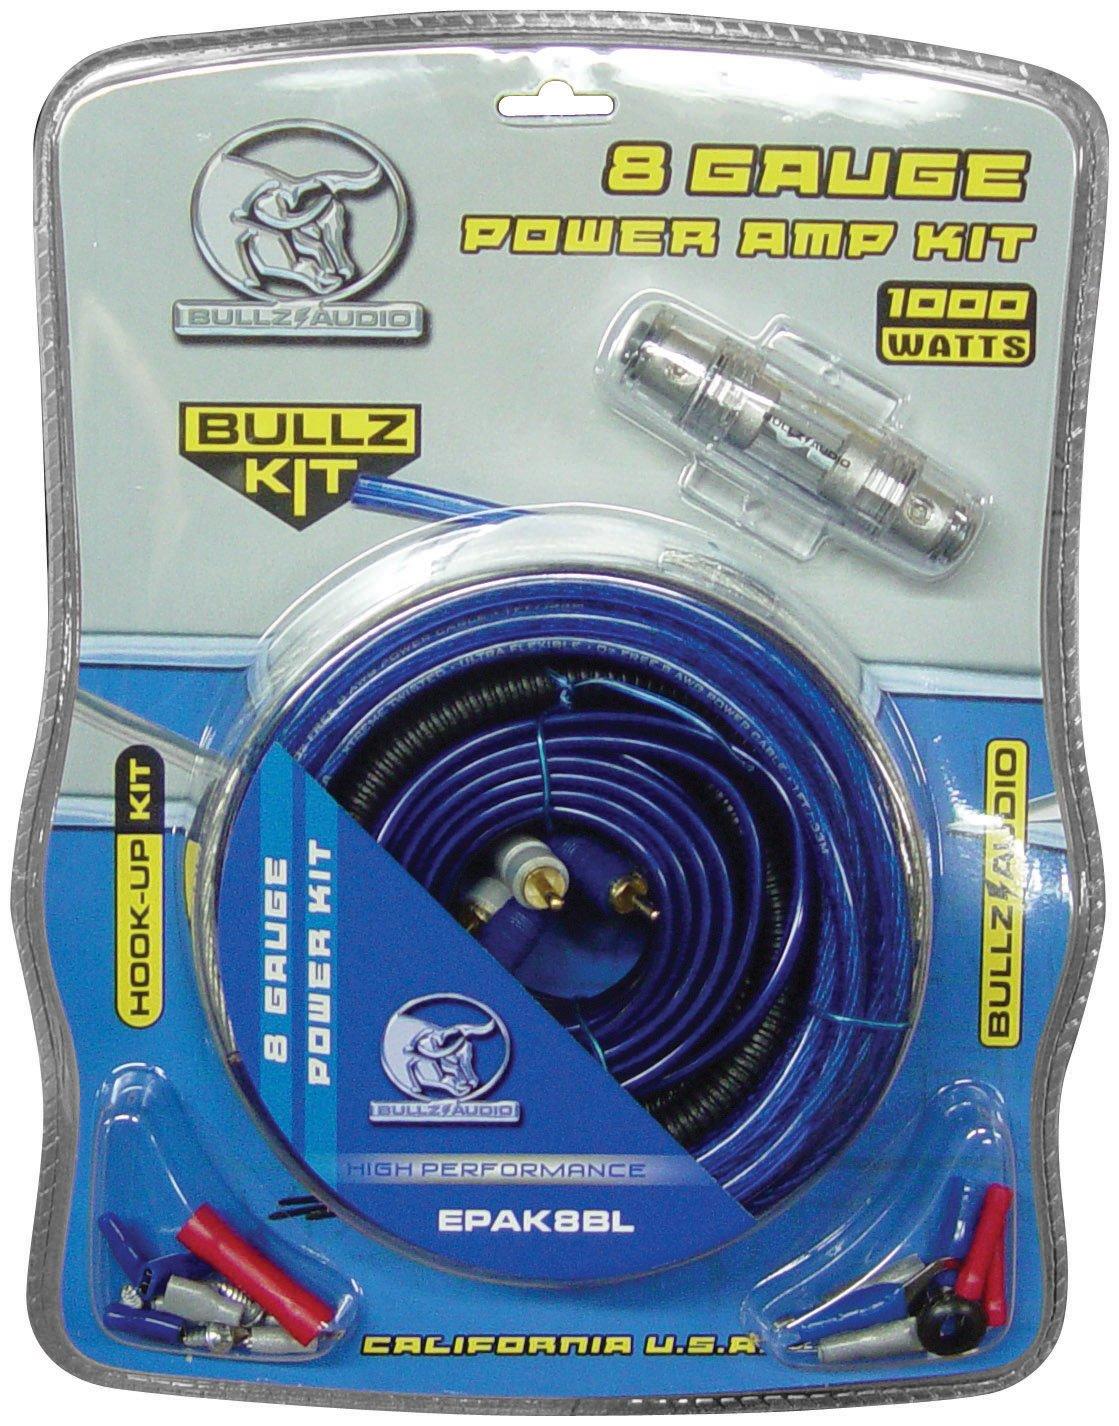 Audio Epak8bl 8 Gauge Amplifier Amp Wiring Kit Installation Cable Bullz 4 Car Sub Power Install Amazon Com Xscorpion With